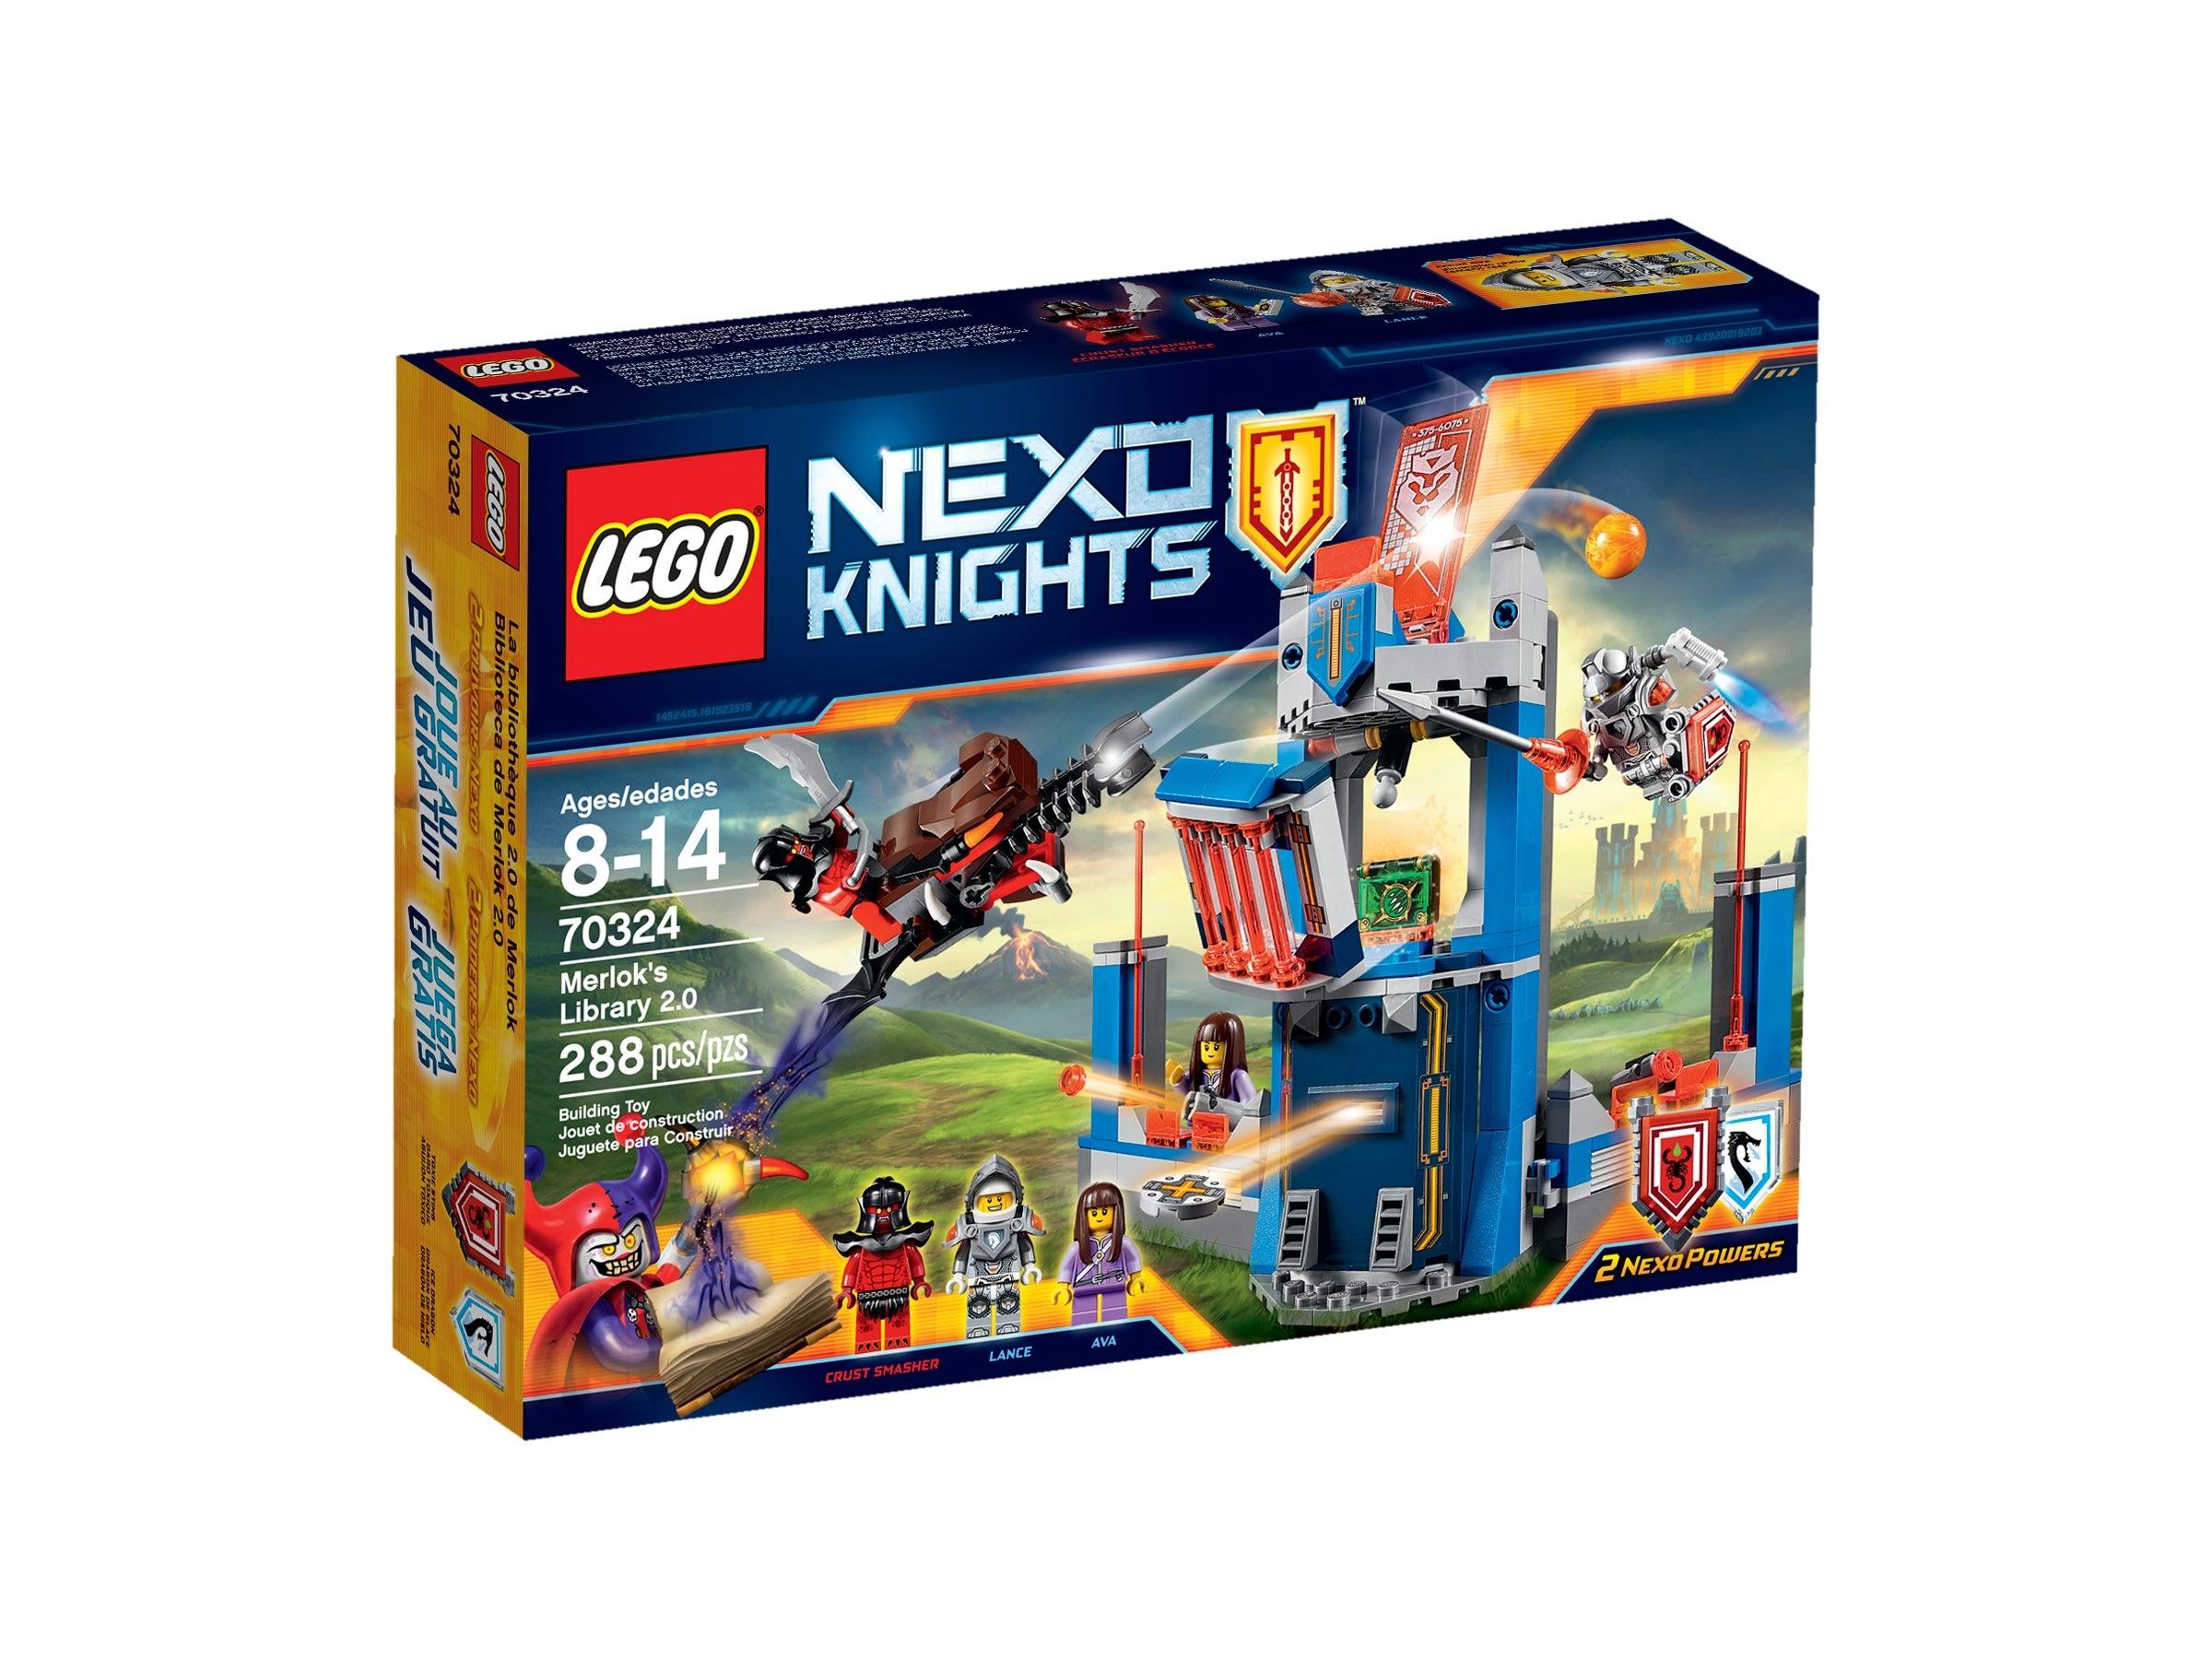 City  Town Classic Chima Castle  Nexo Knights Lego Mini Figures